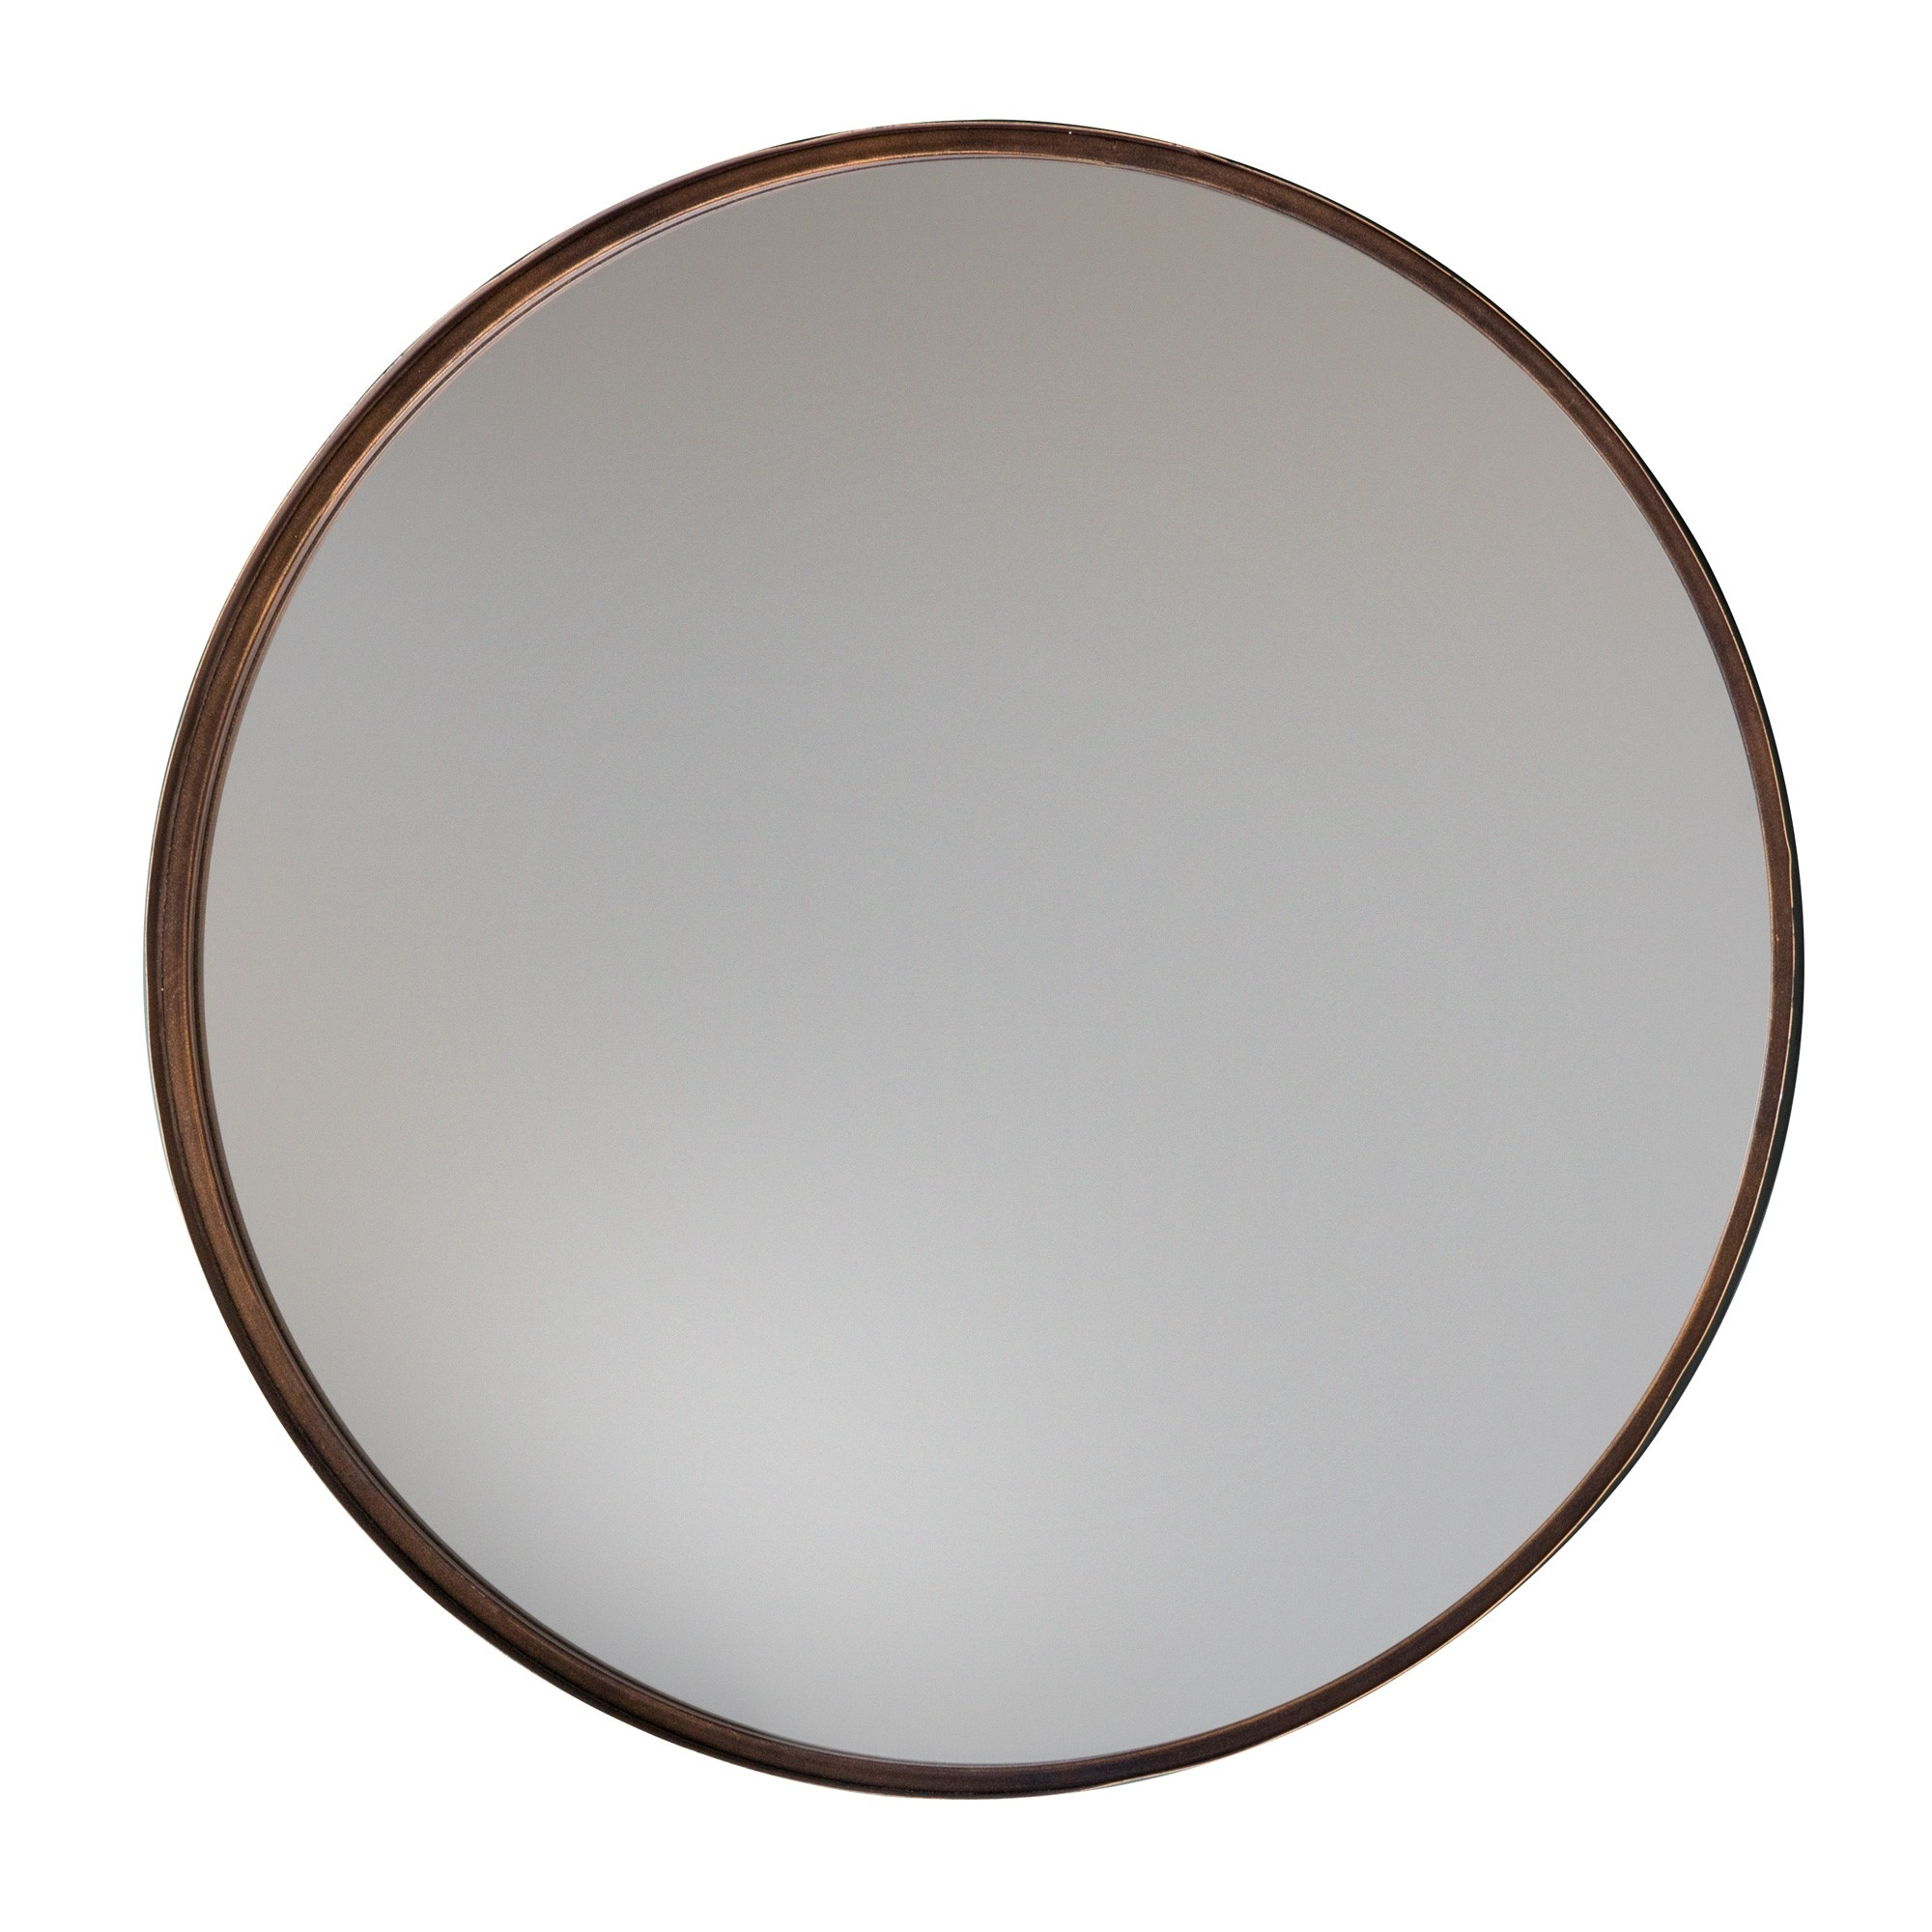 Metal Frame Round Wall Mirror, 61cm